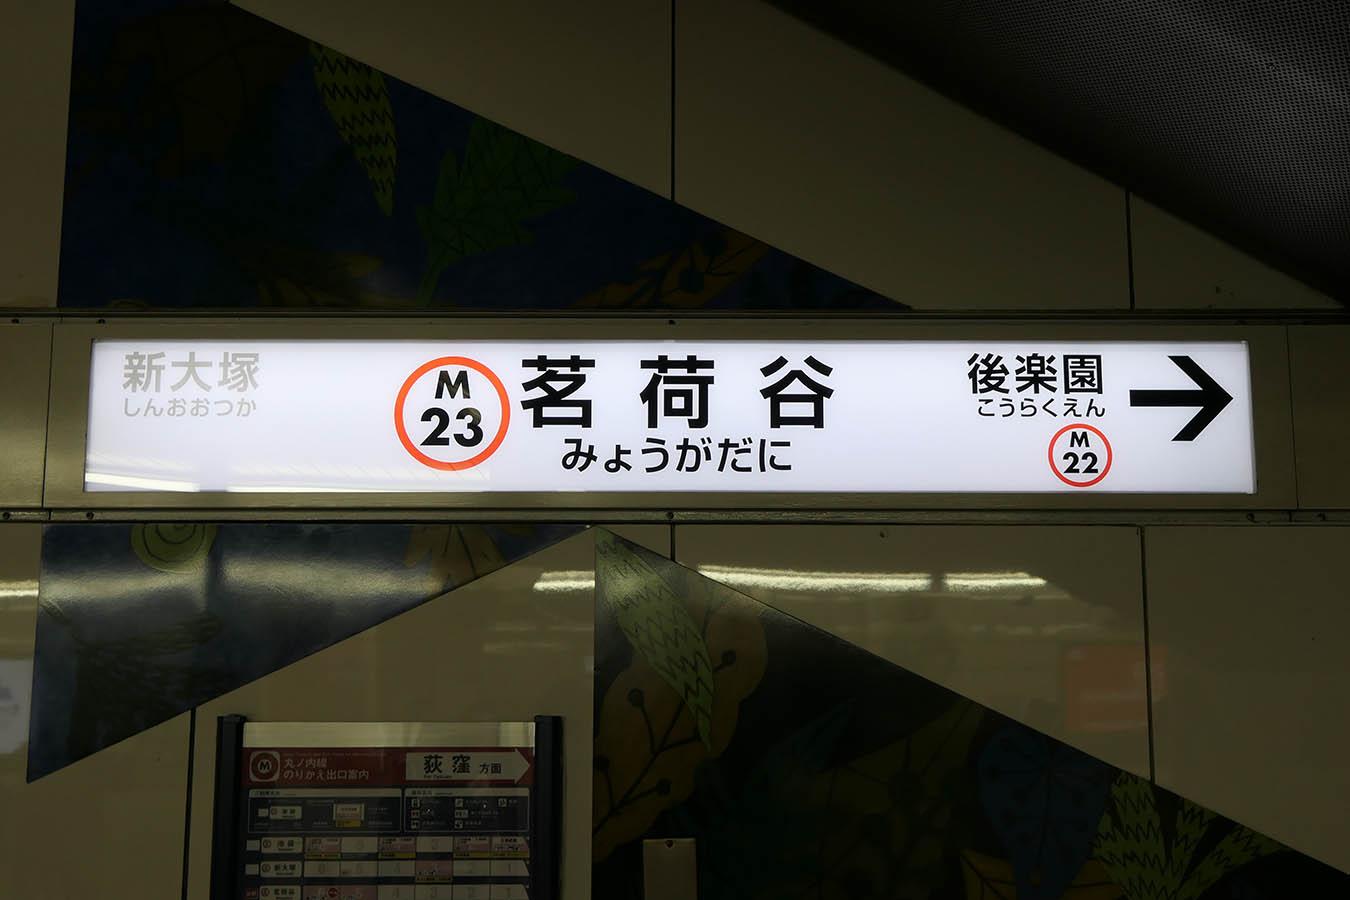 M23_photo06.jpg